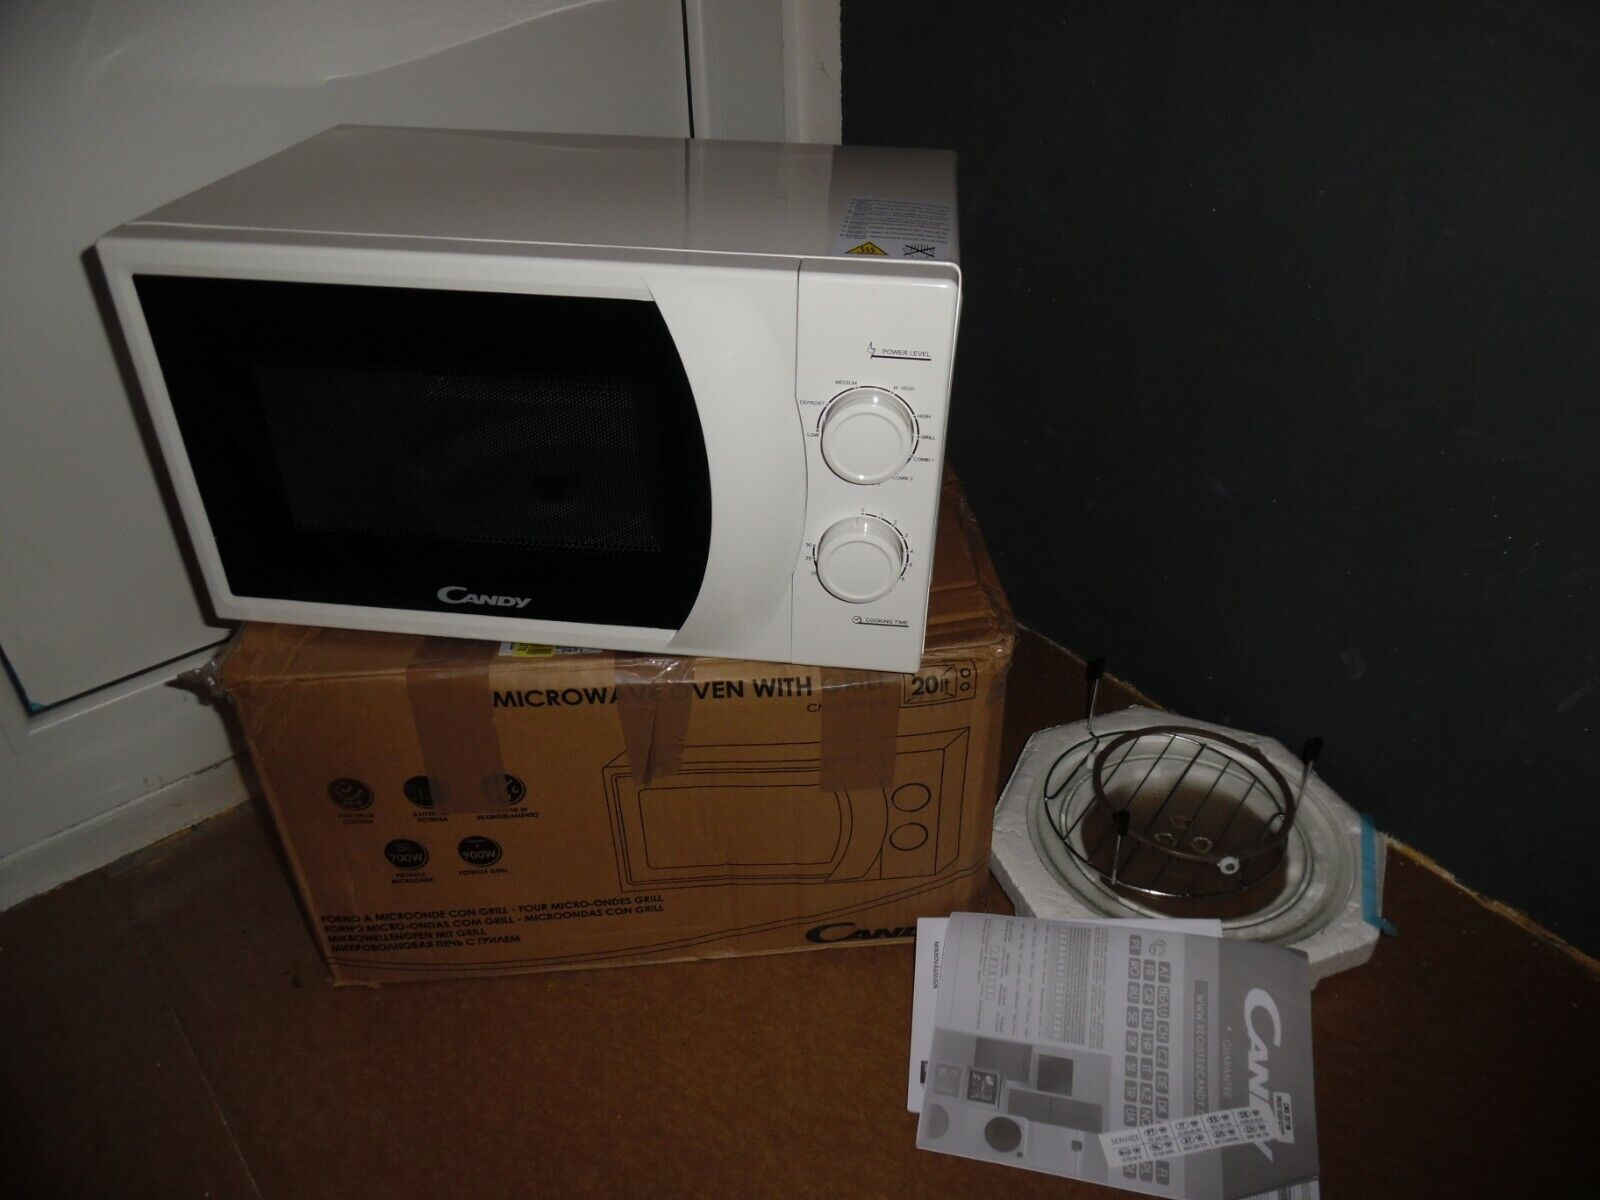 Candy CMG2071M Microonde 700W con Grill 900W, 20 L, Bianco, Timer, 9 Programmi